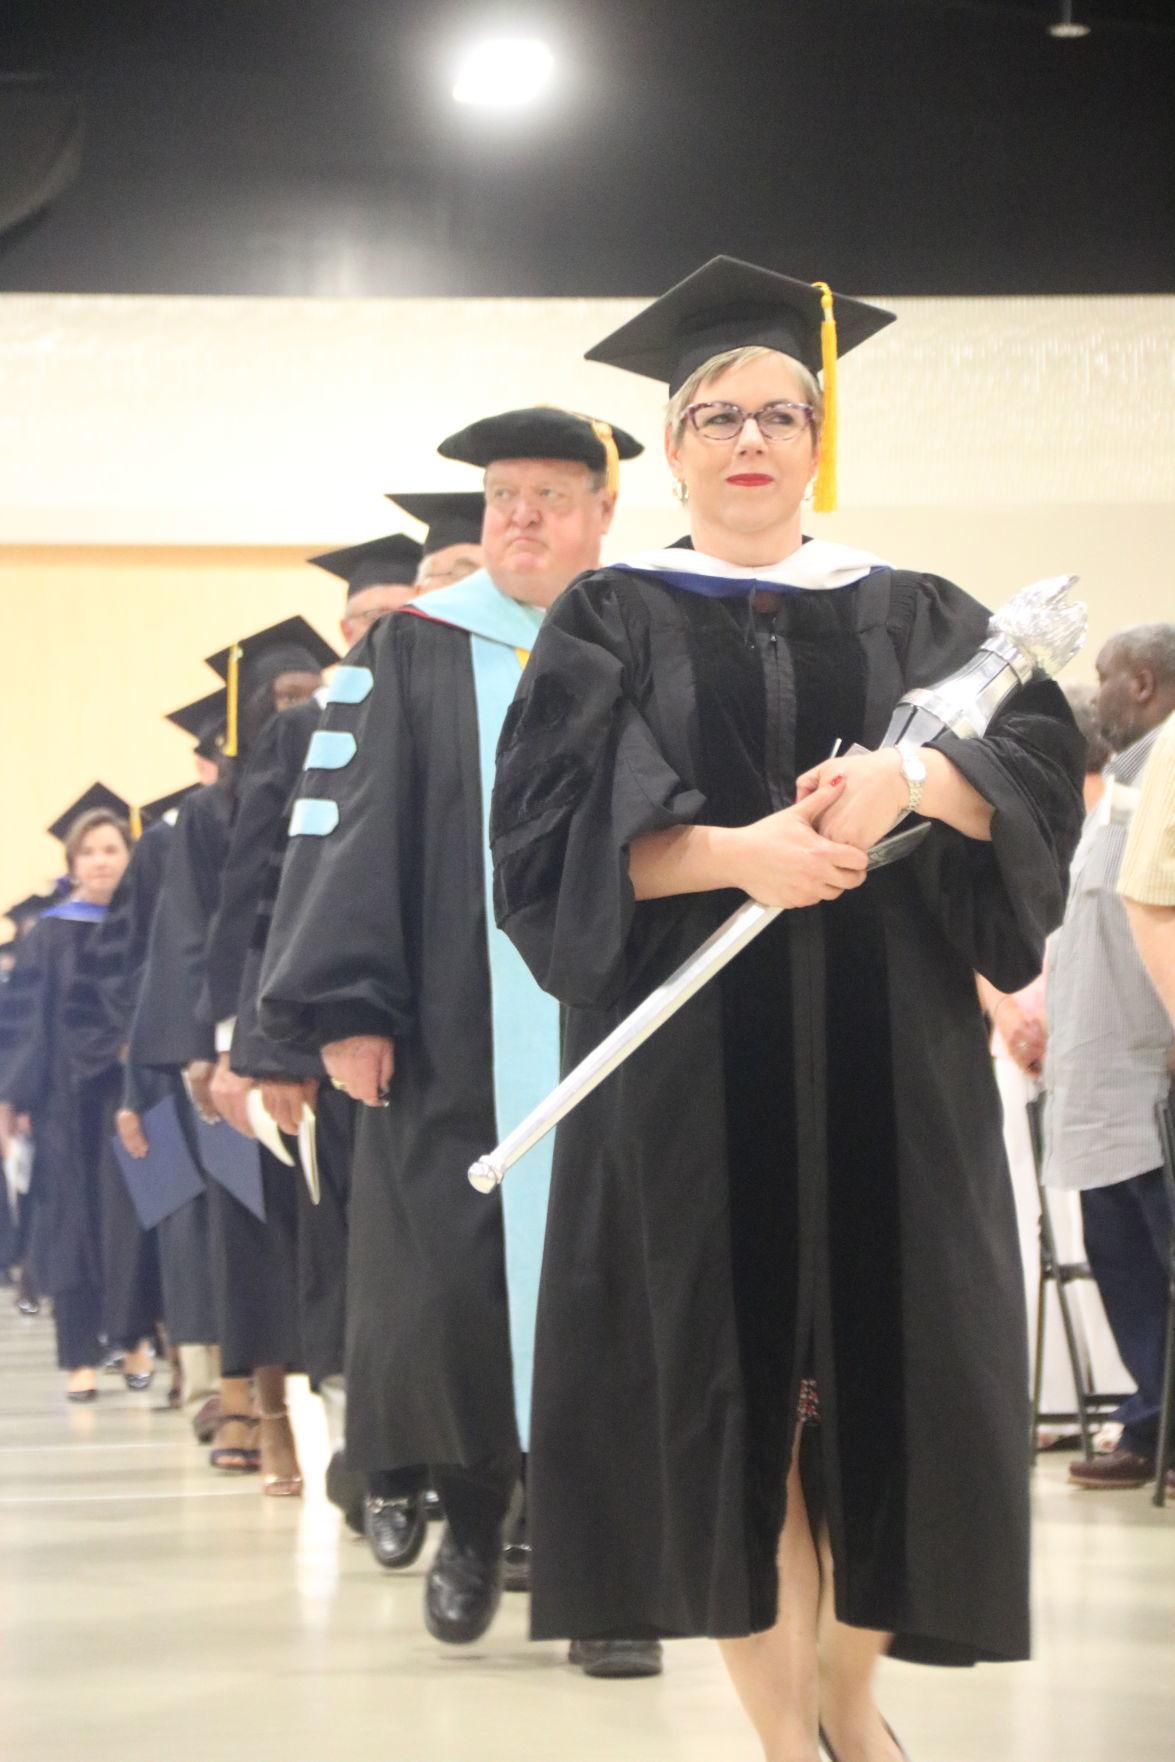 PTC spring 2019 graduation